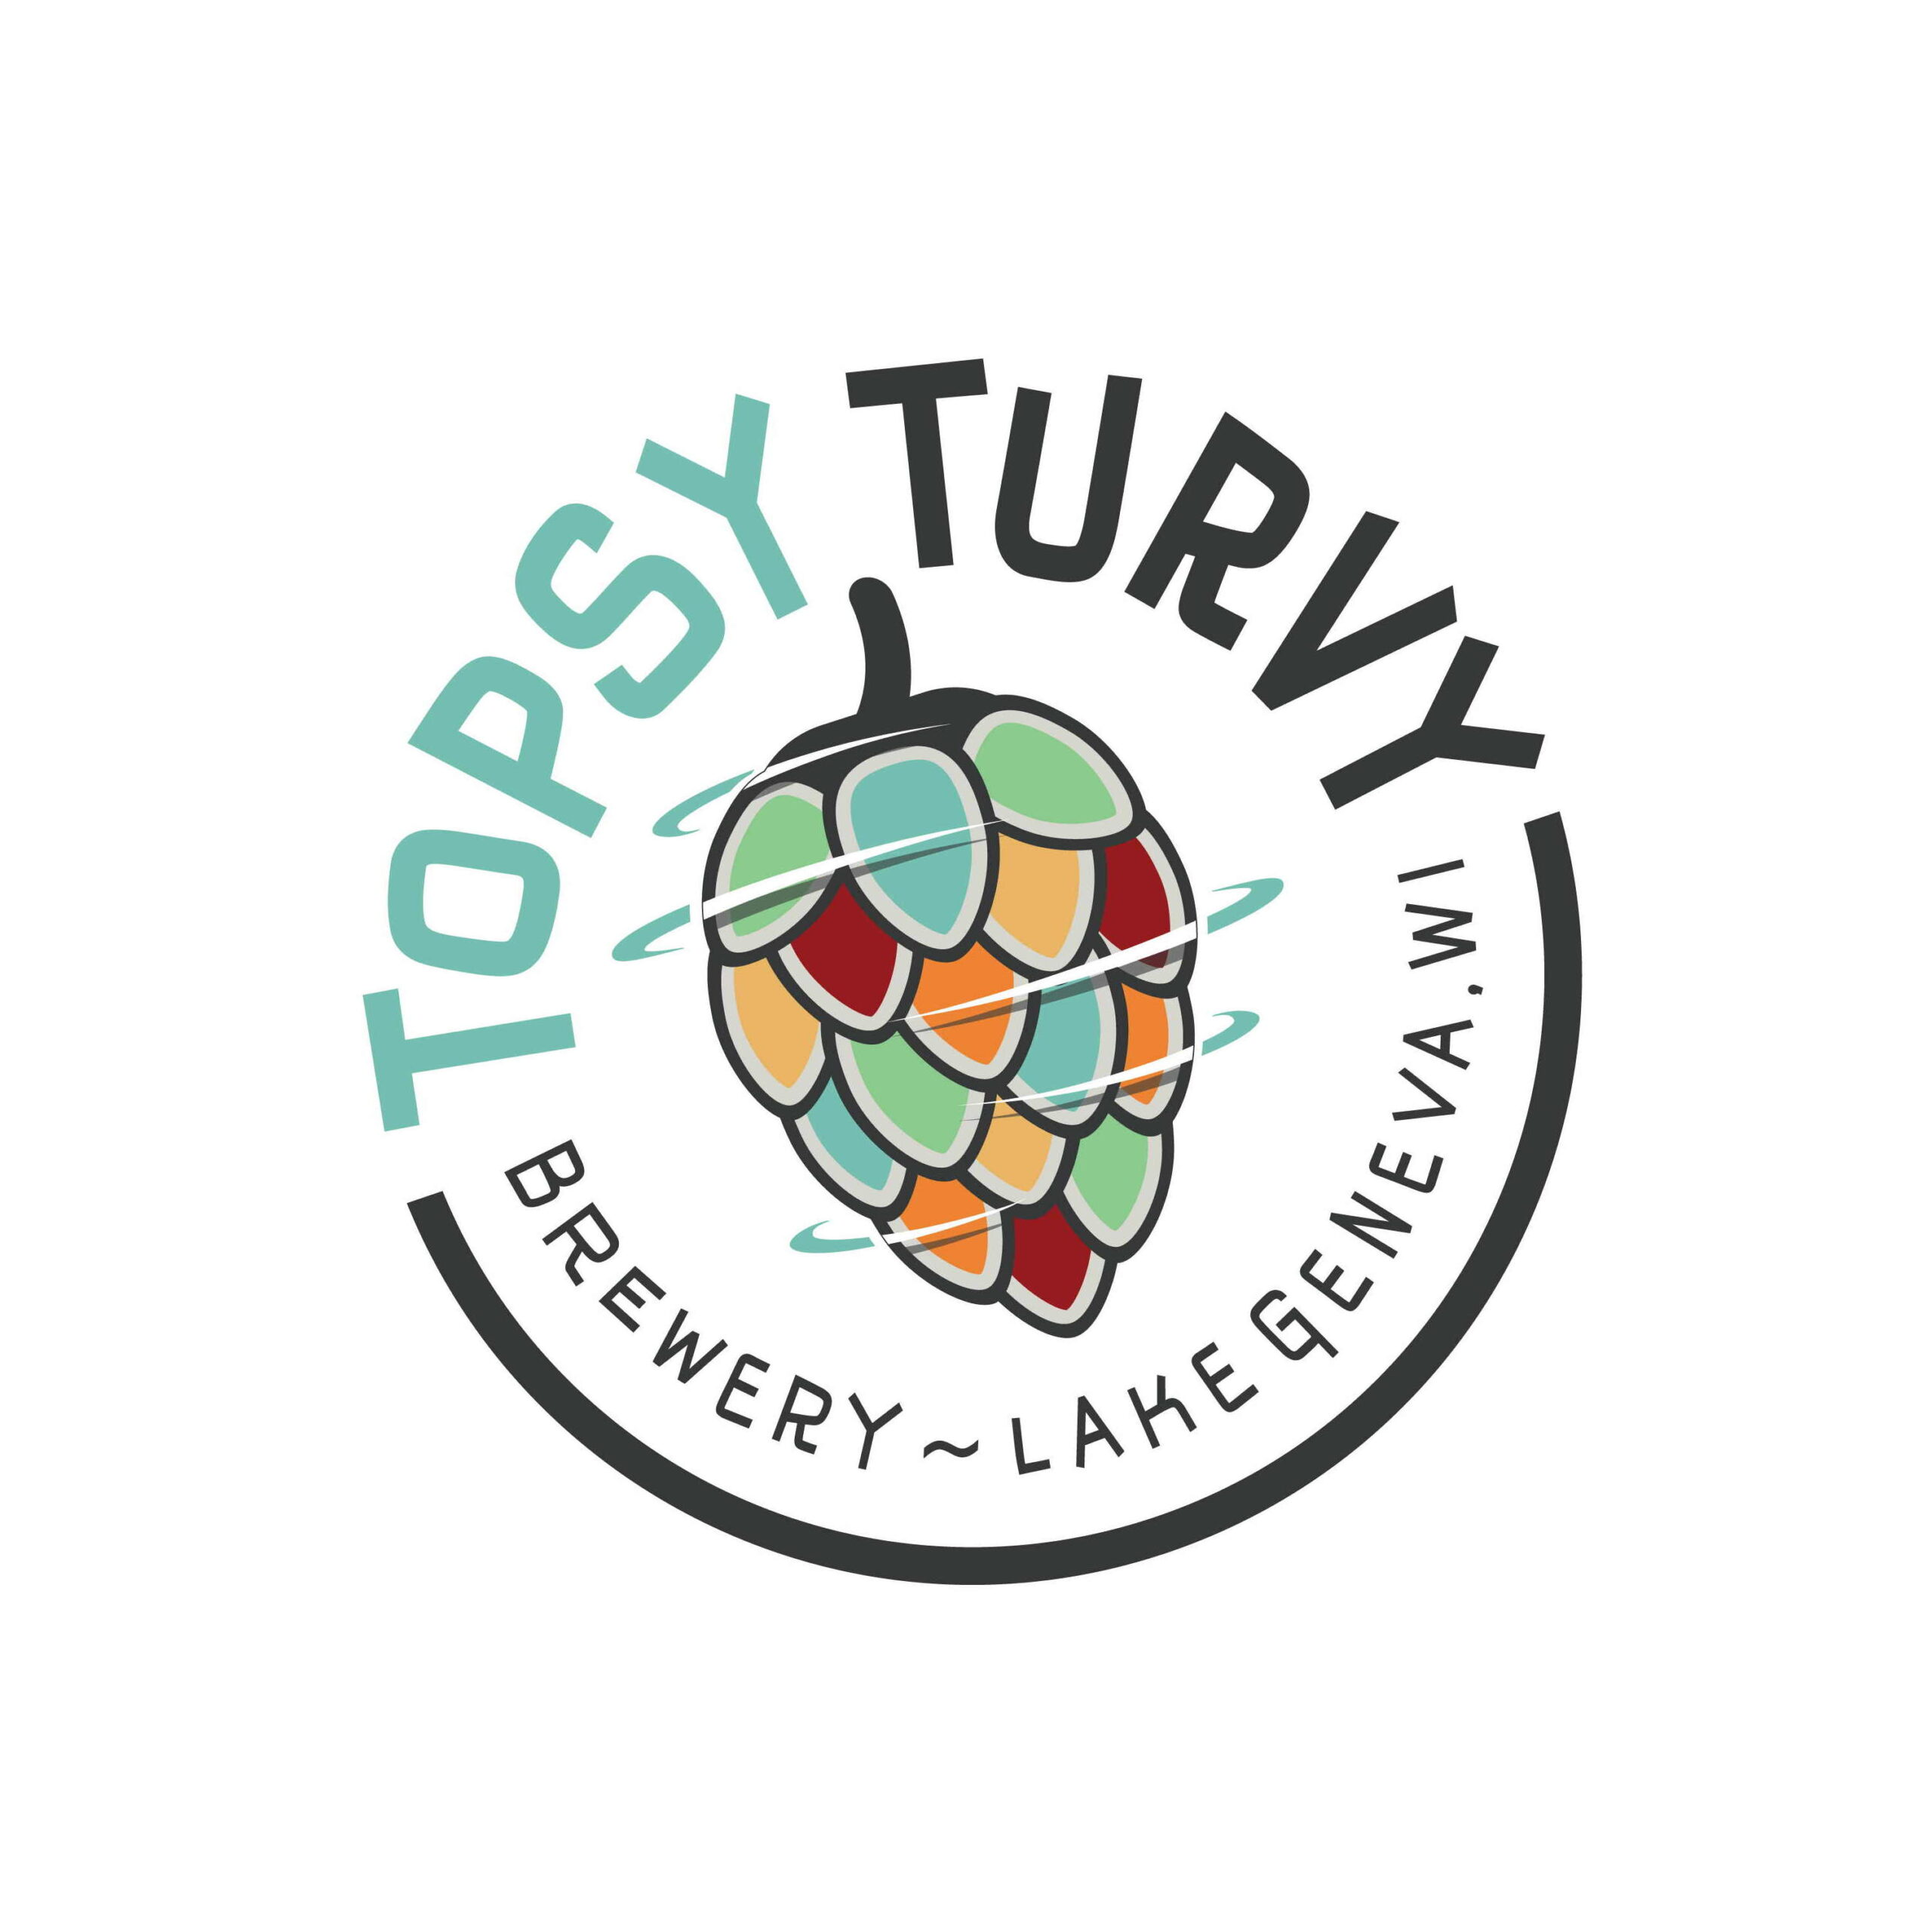 Topsy Turvy Brewery, Lake Geneva WI